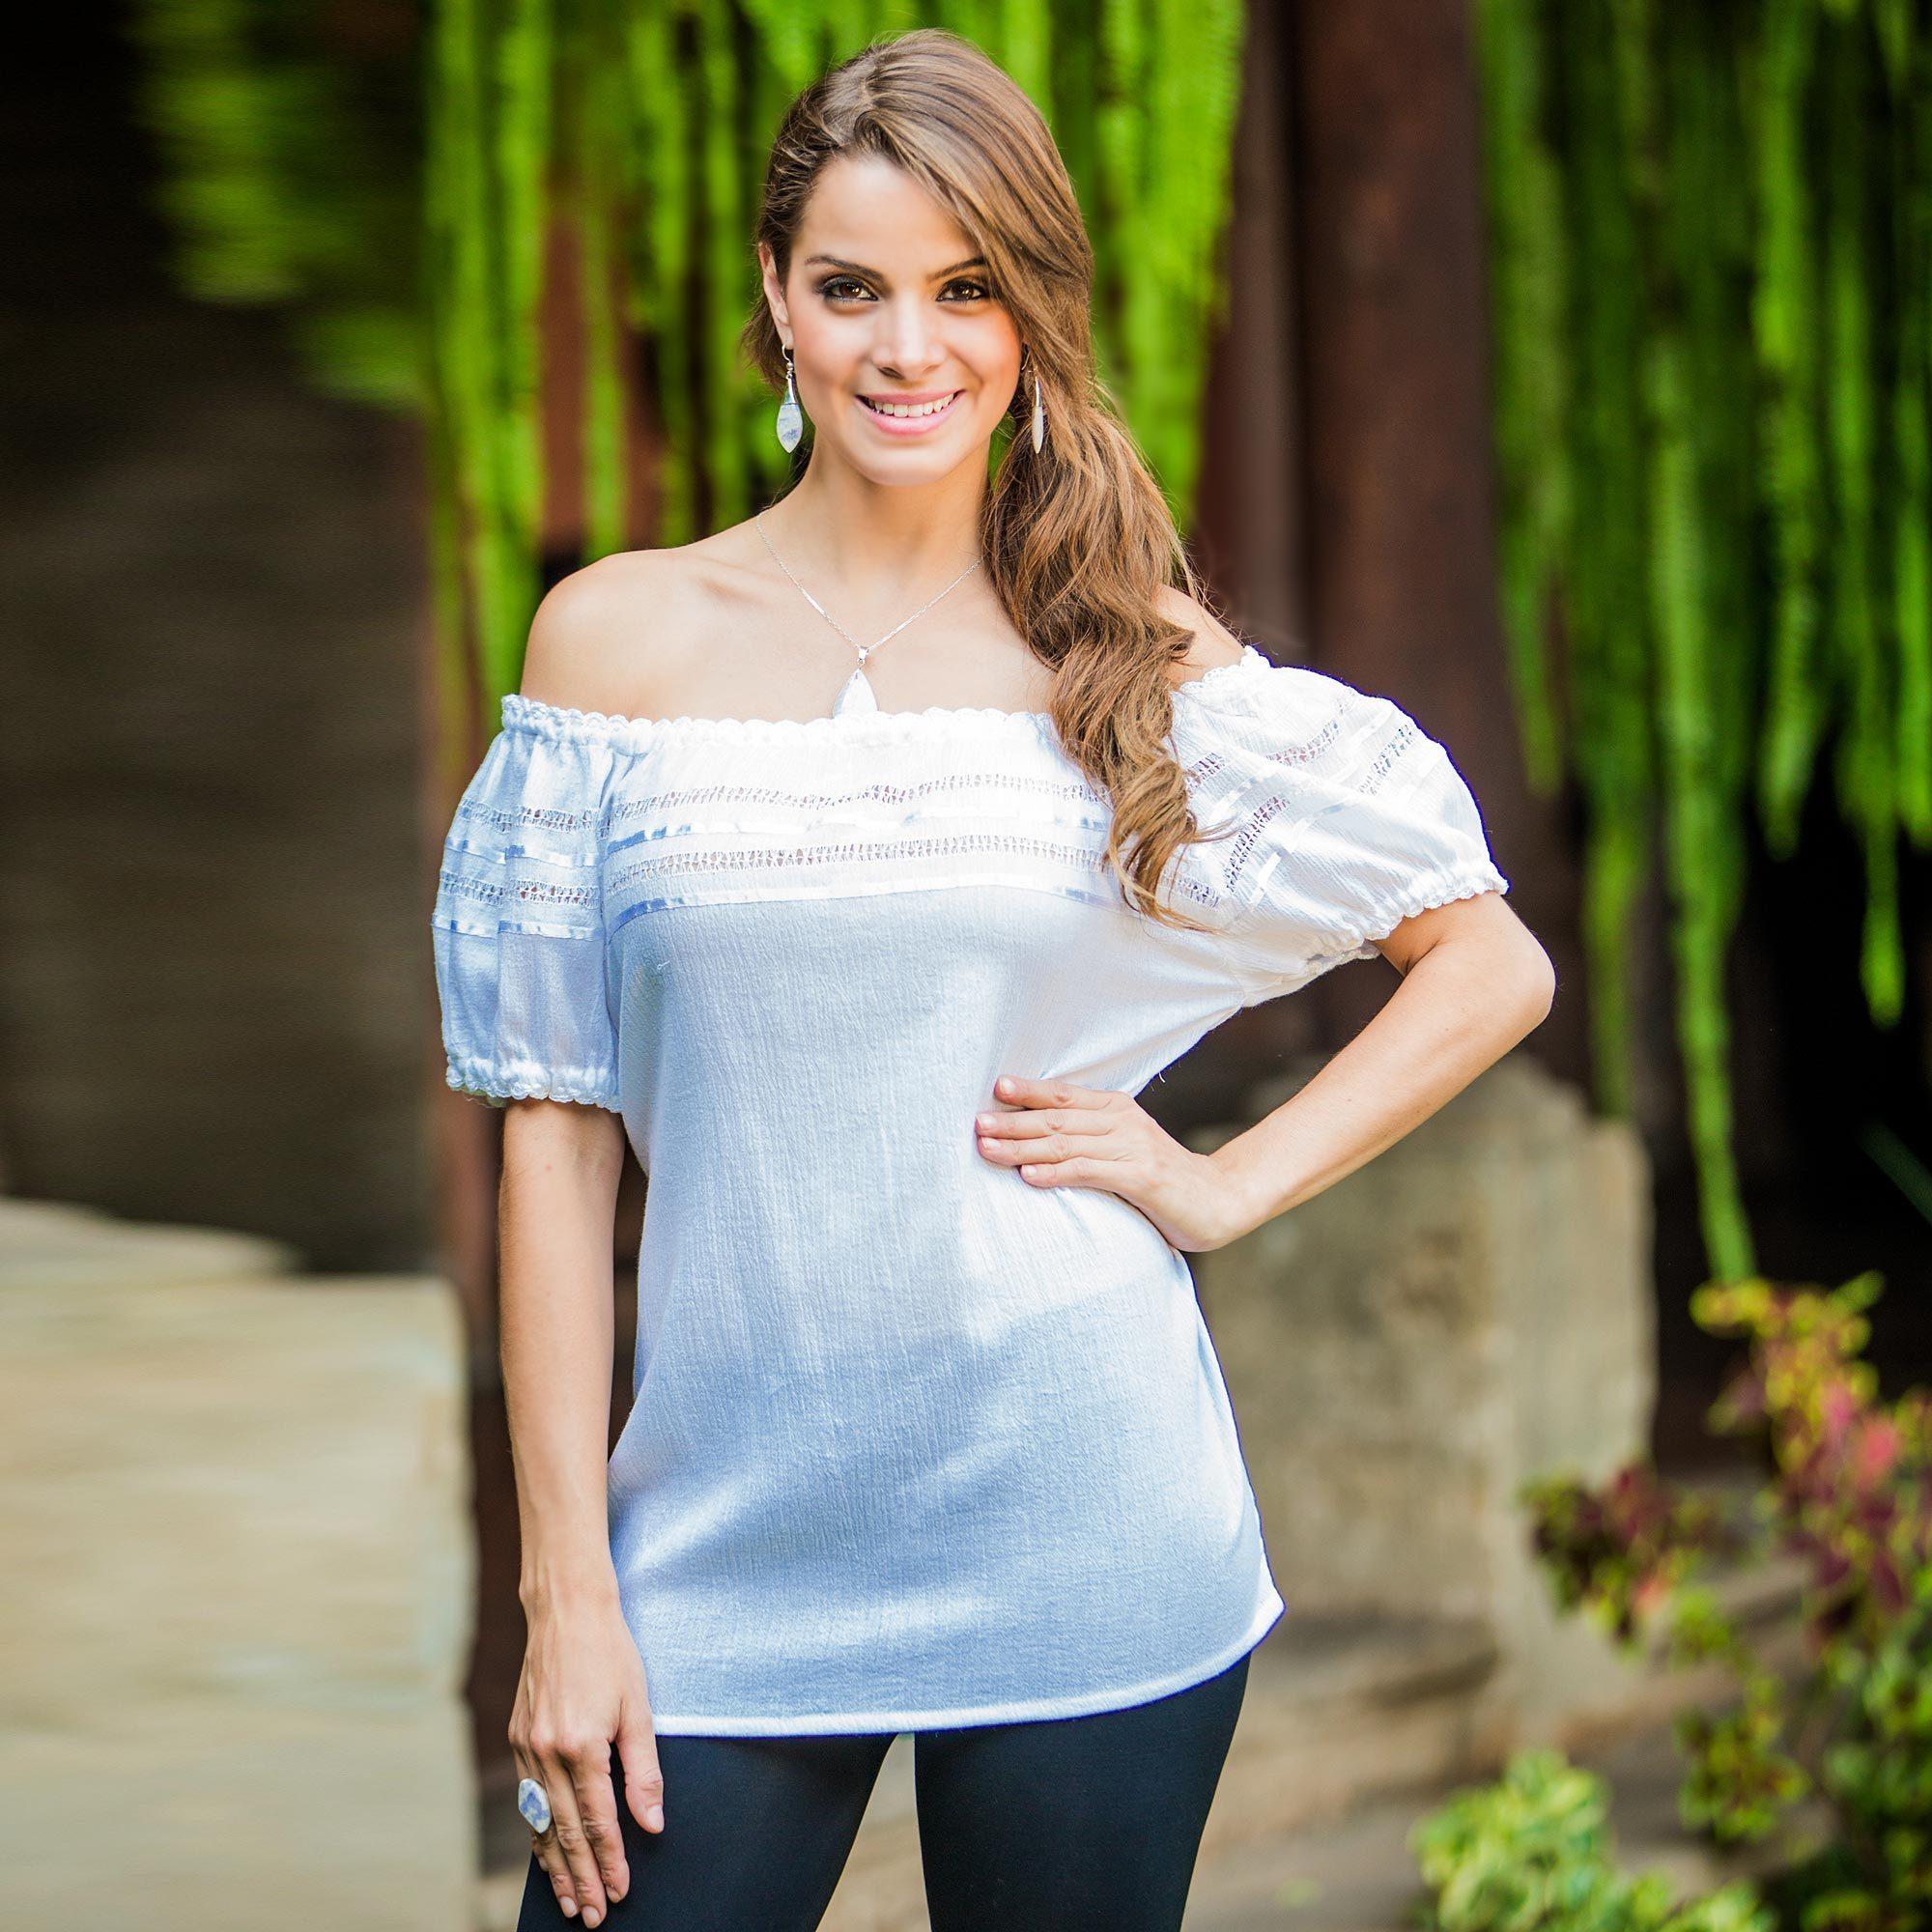 Image result for Beautiful girl in El Salvador